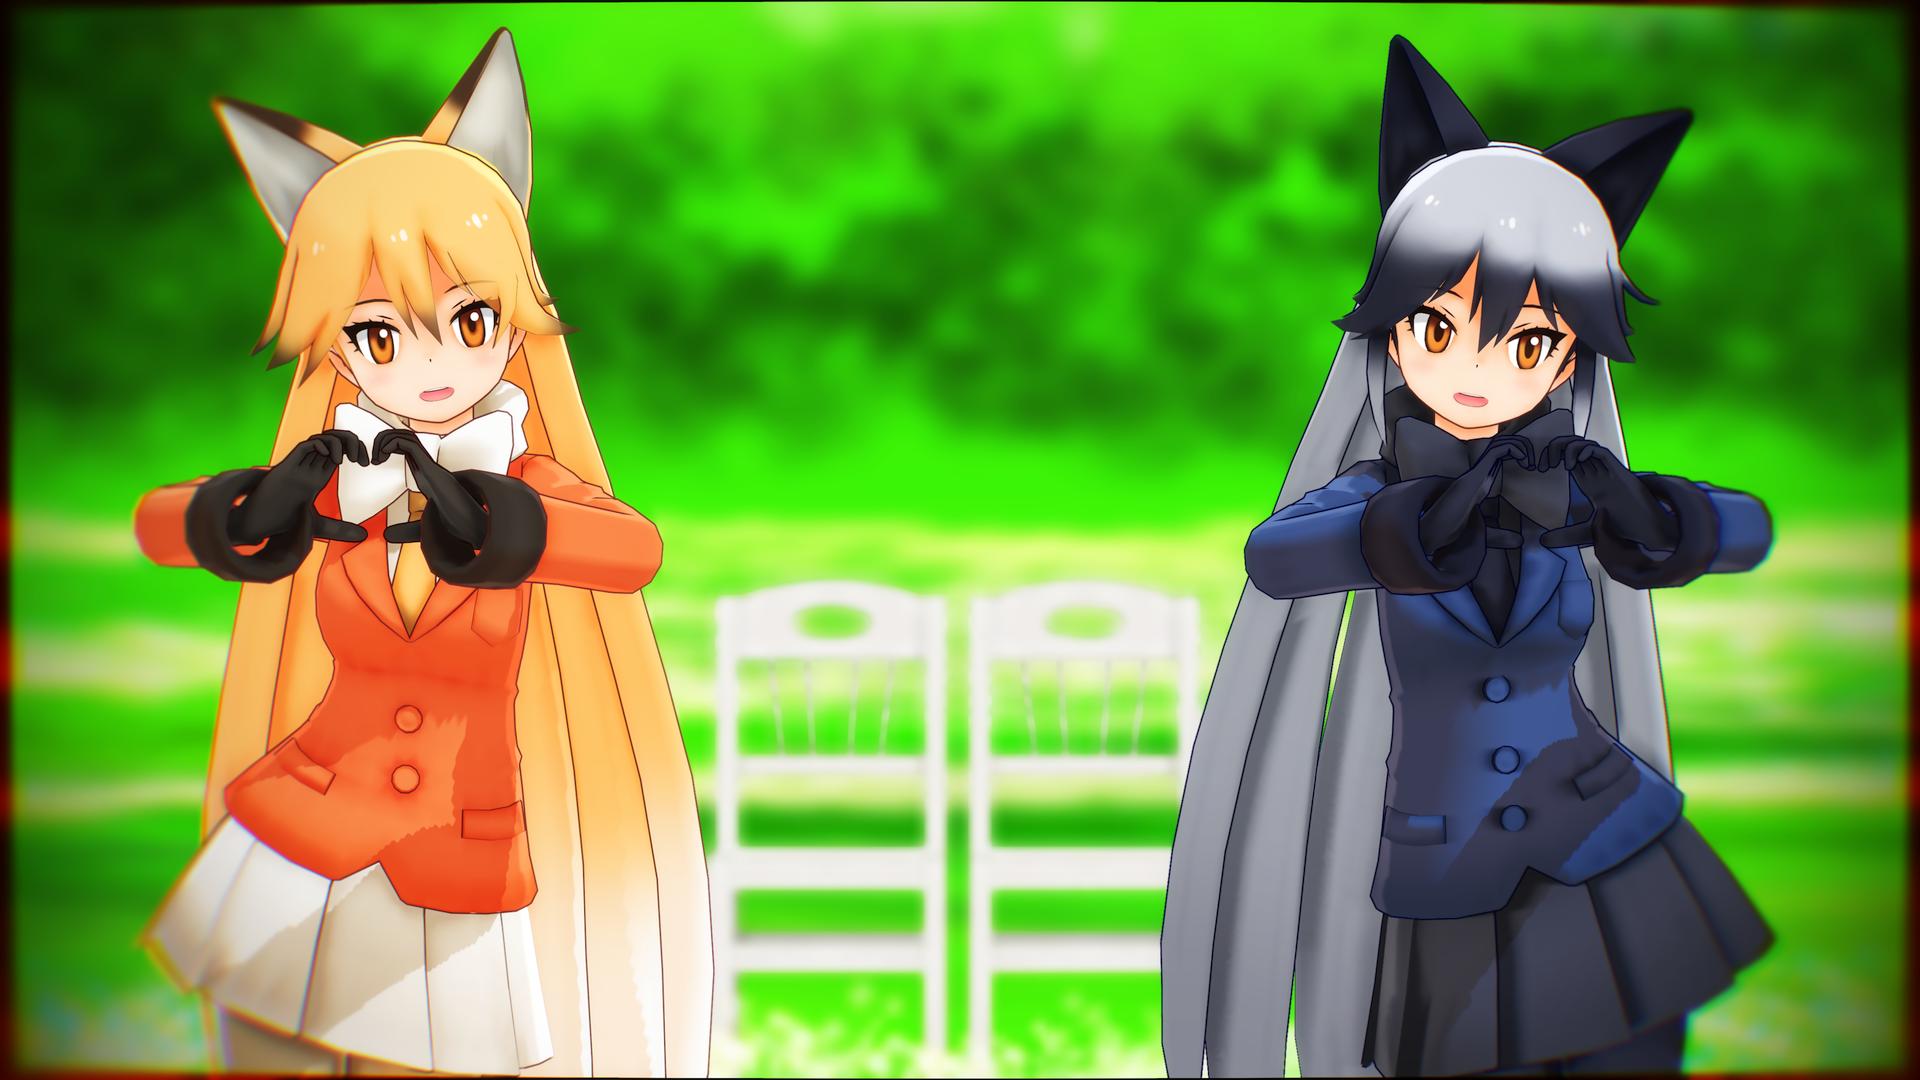 Ezo Red Fox And Silver Fox Fondo De Pantalla Hd Fondo De